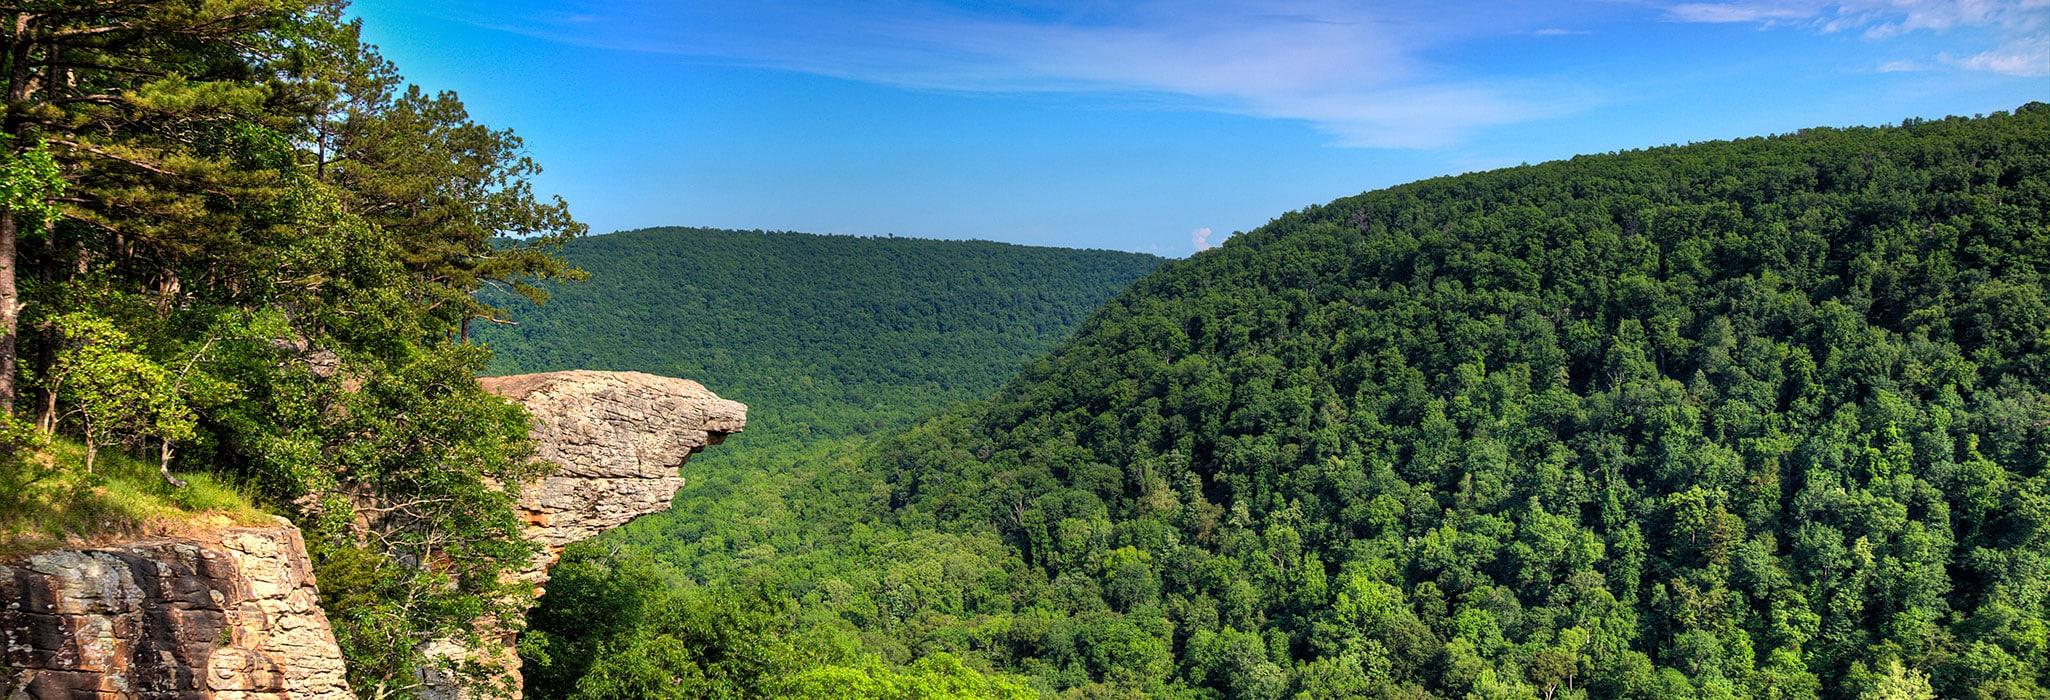 Whitaker's Point Trail | Arkansas